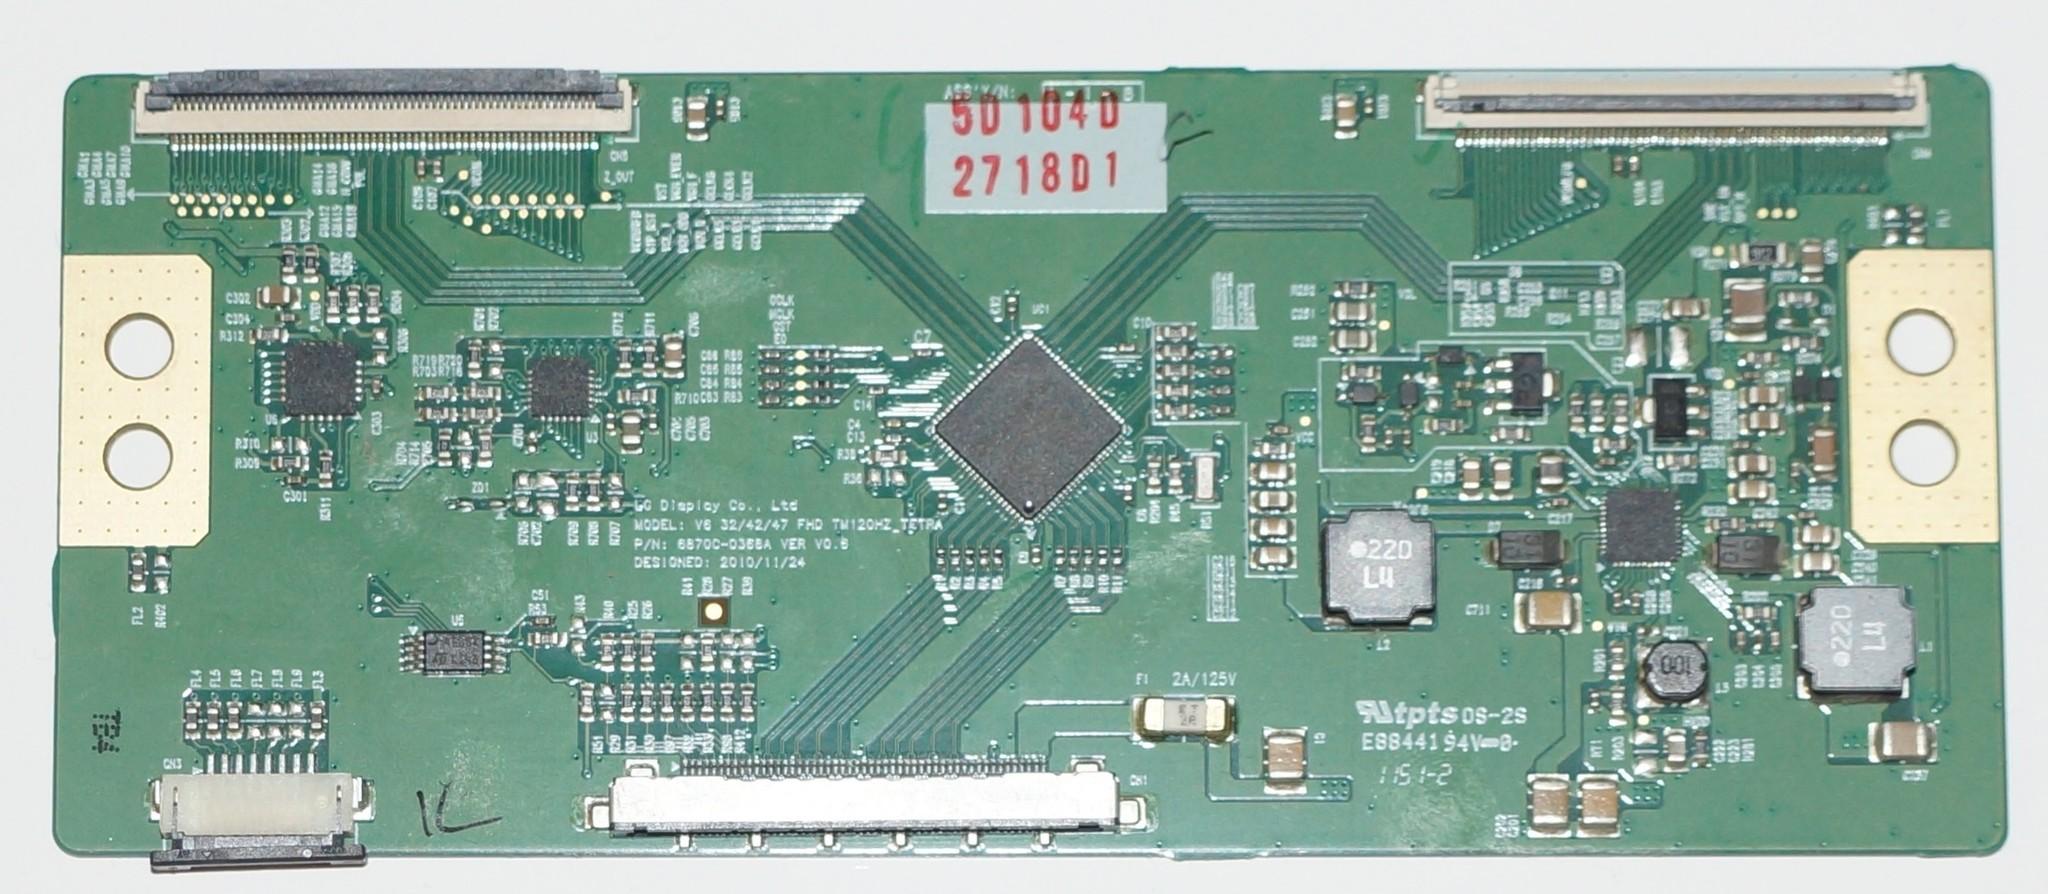 6870C-0368A t-con model V6 32/42/47 FHD TM120Hz